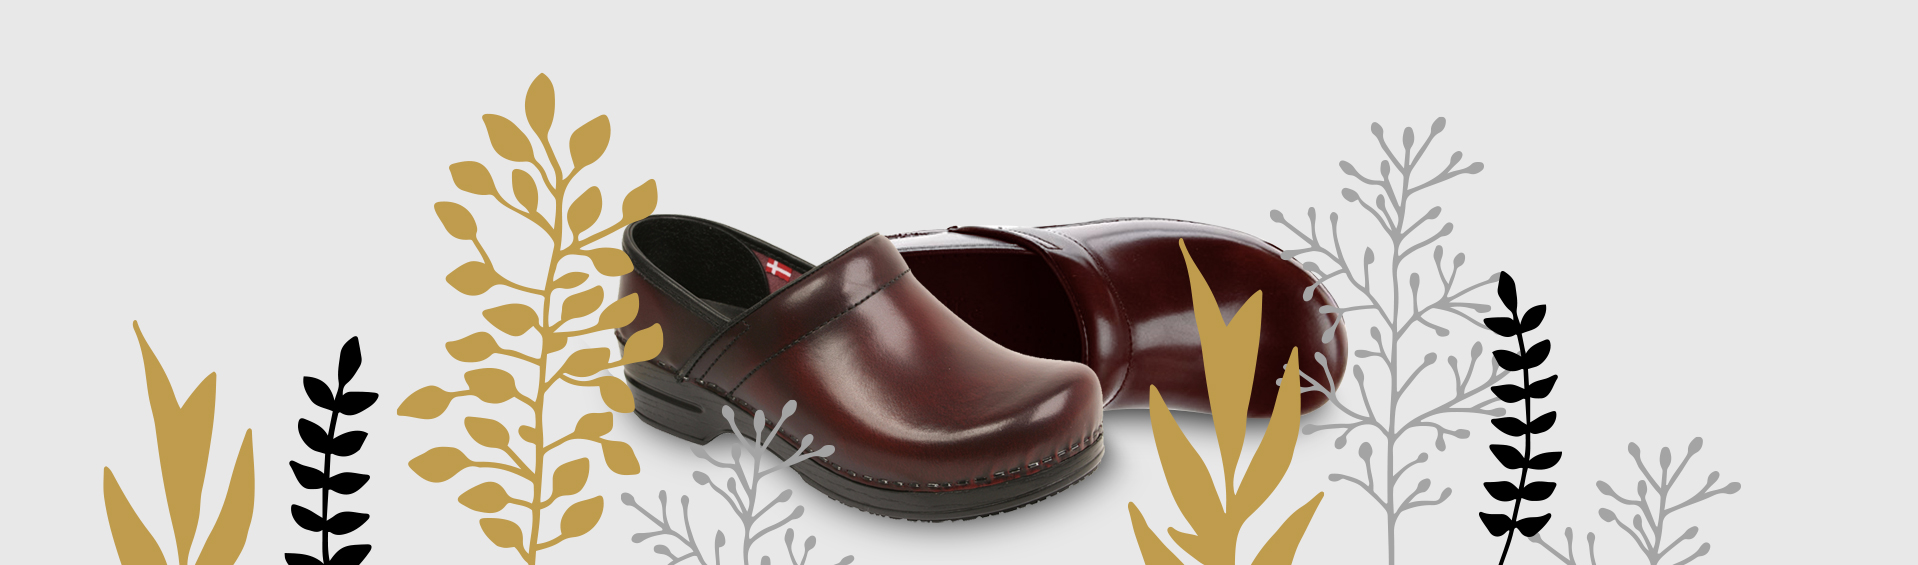 scarpe-Sanita-scarpelli-calzature-prato